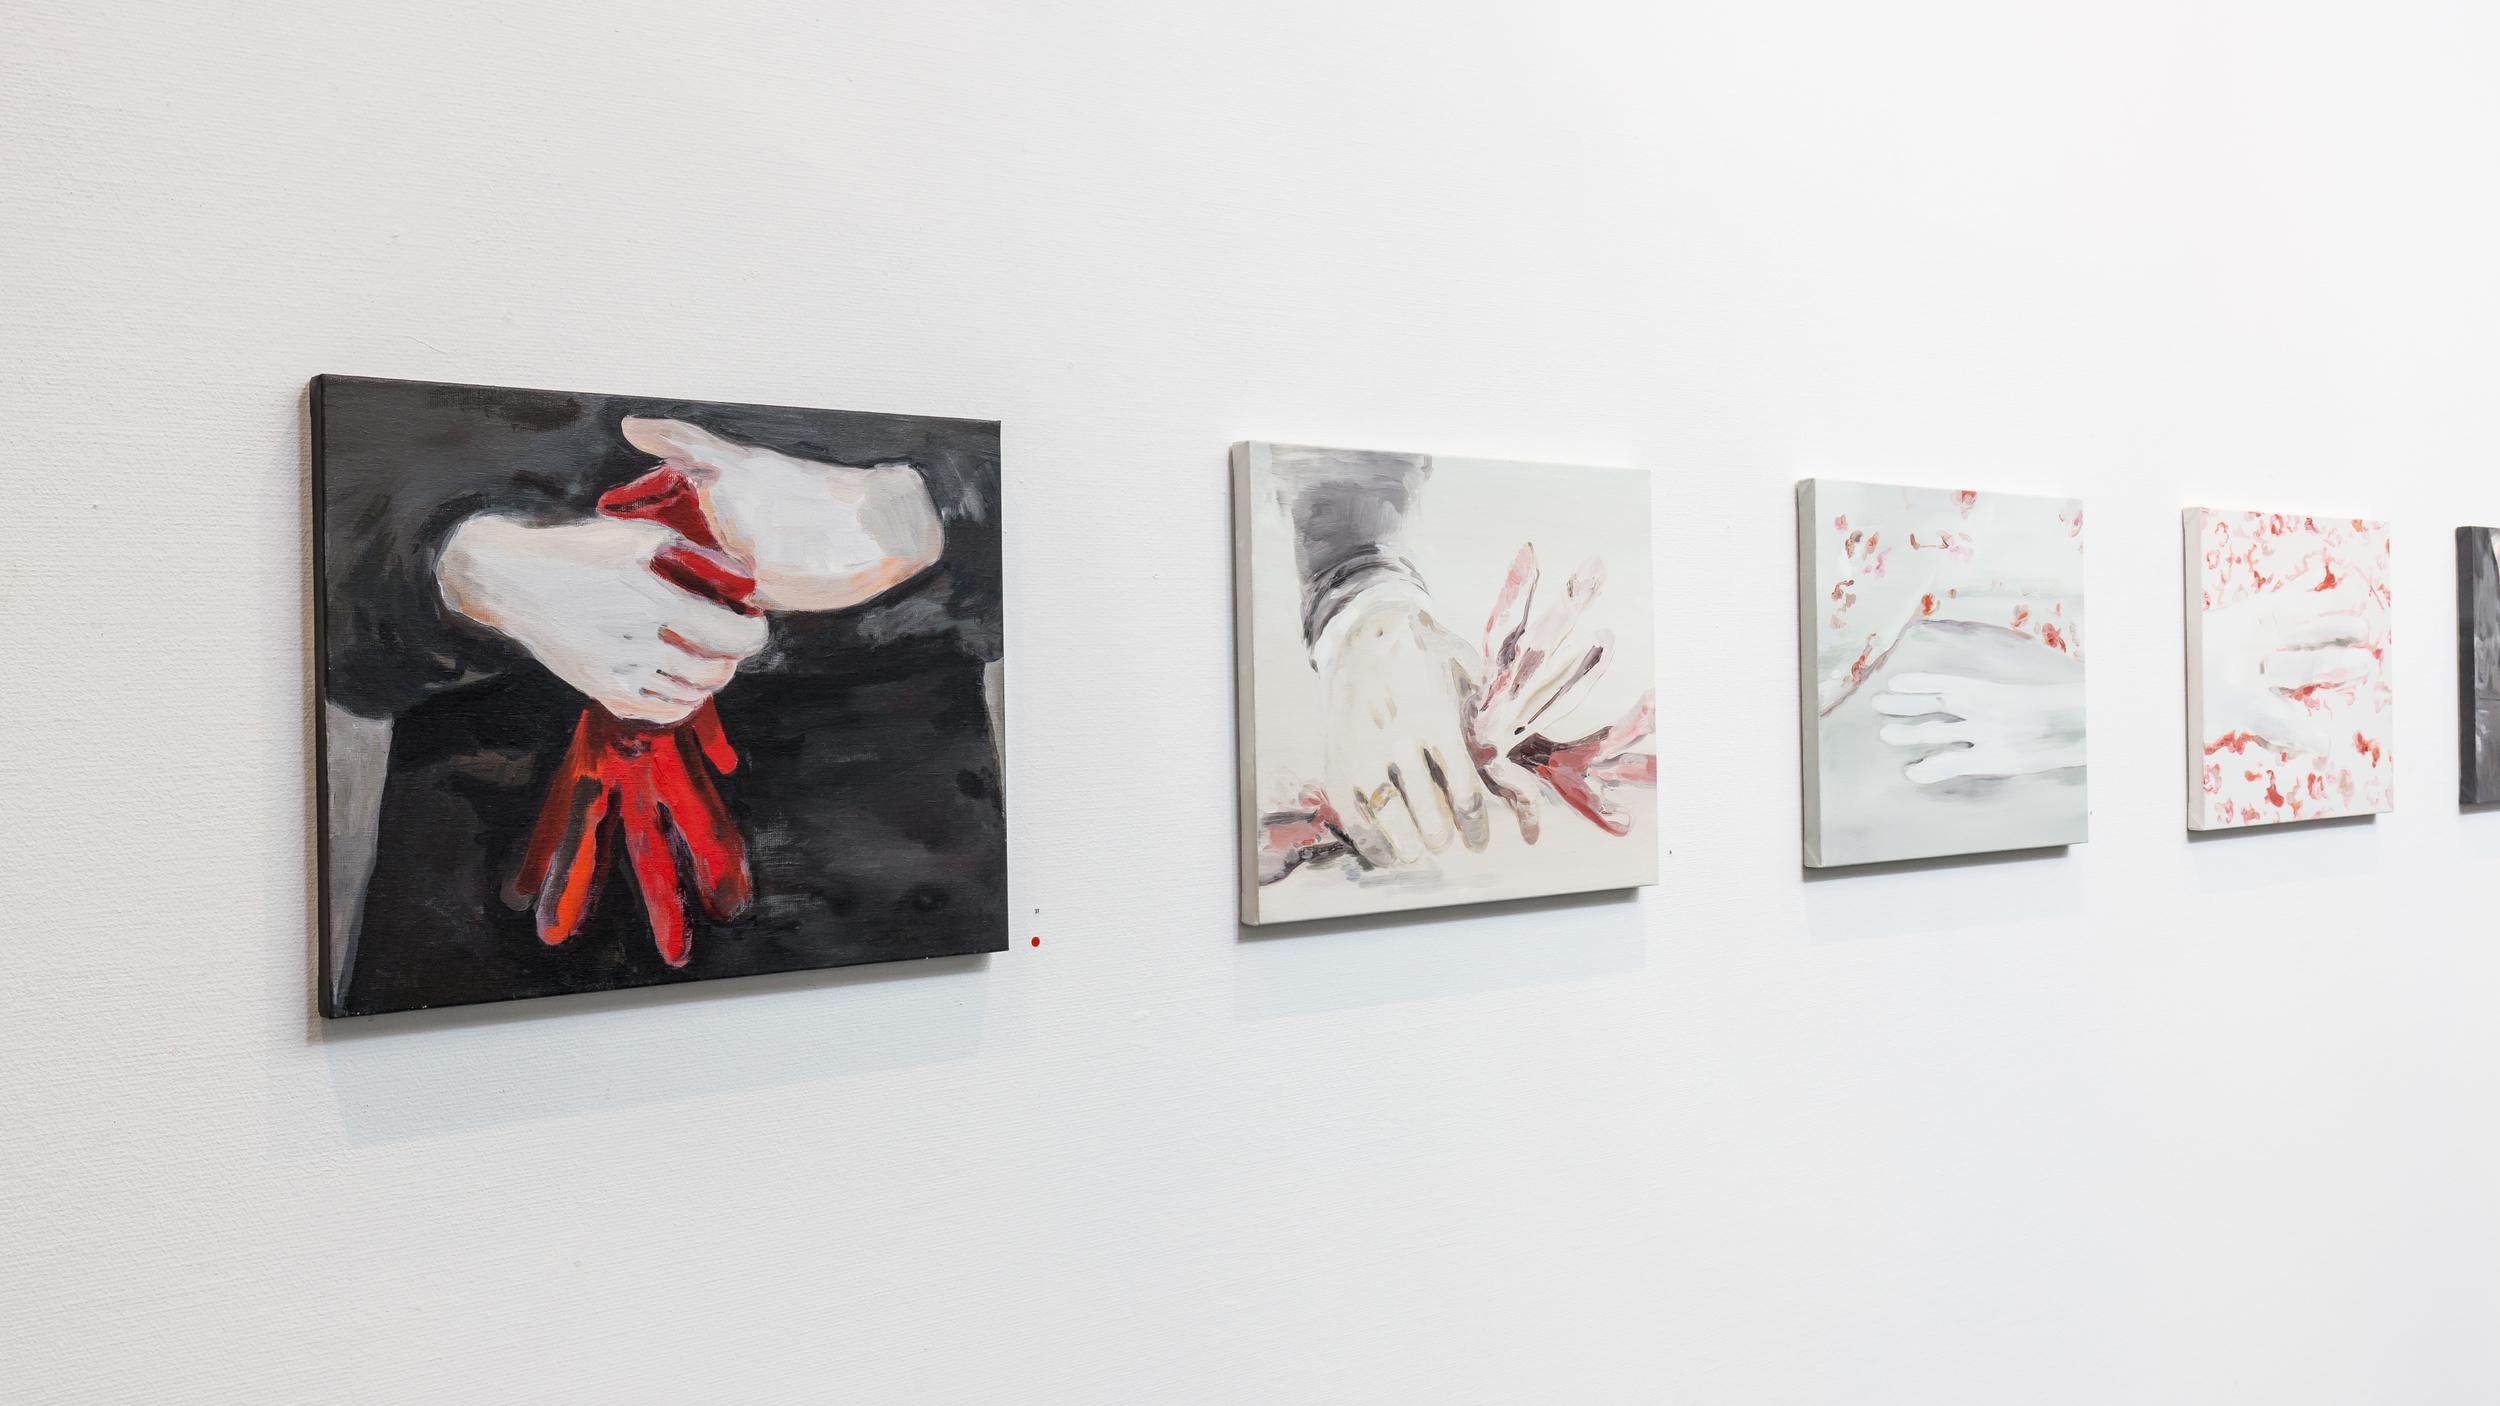 Oeuvres: Françoise Pétrovitch